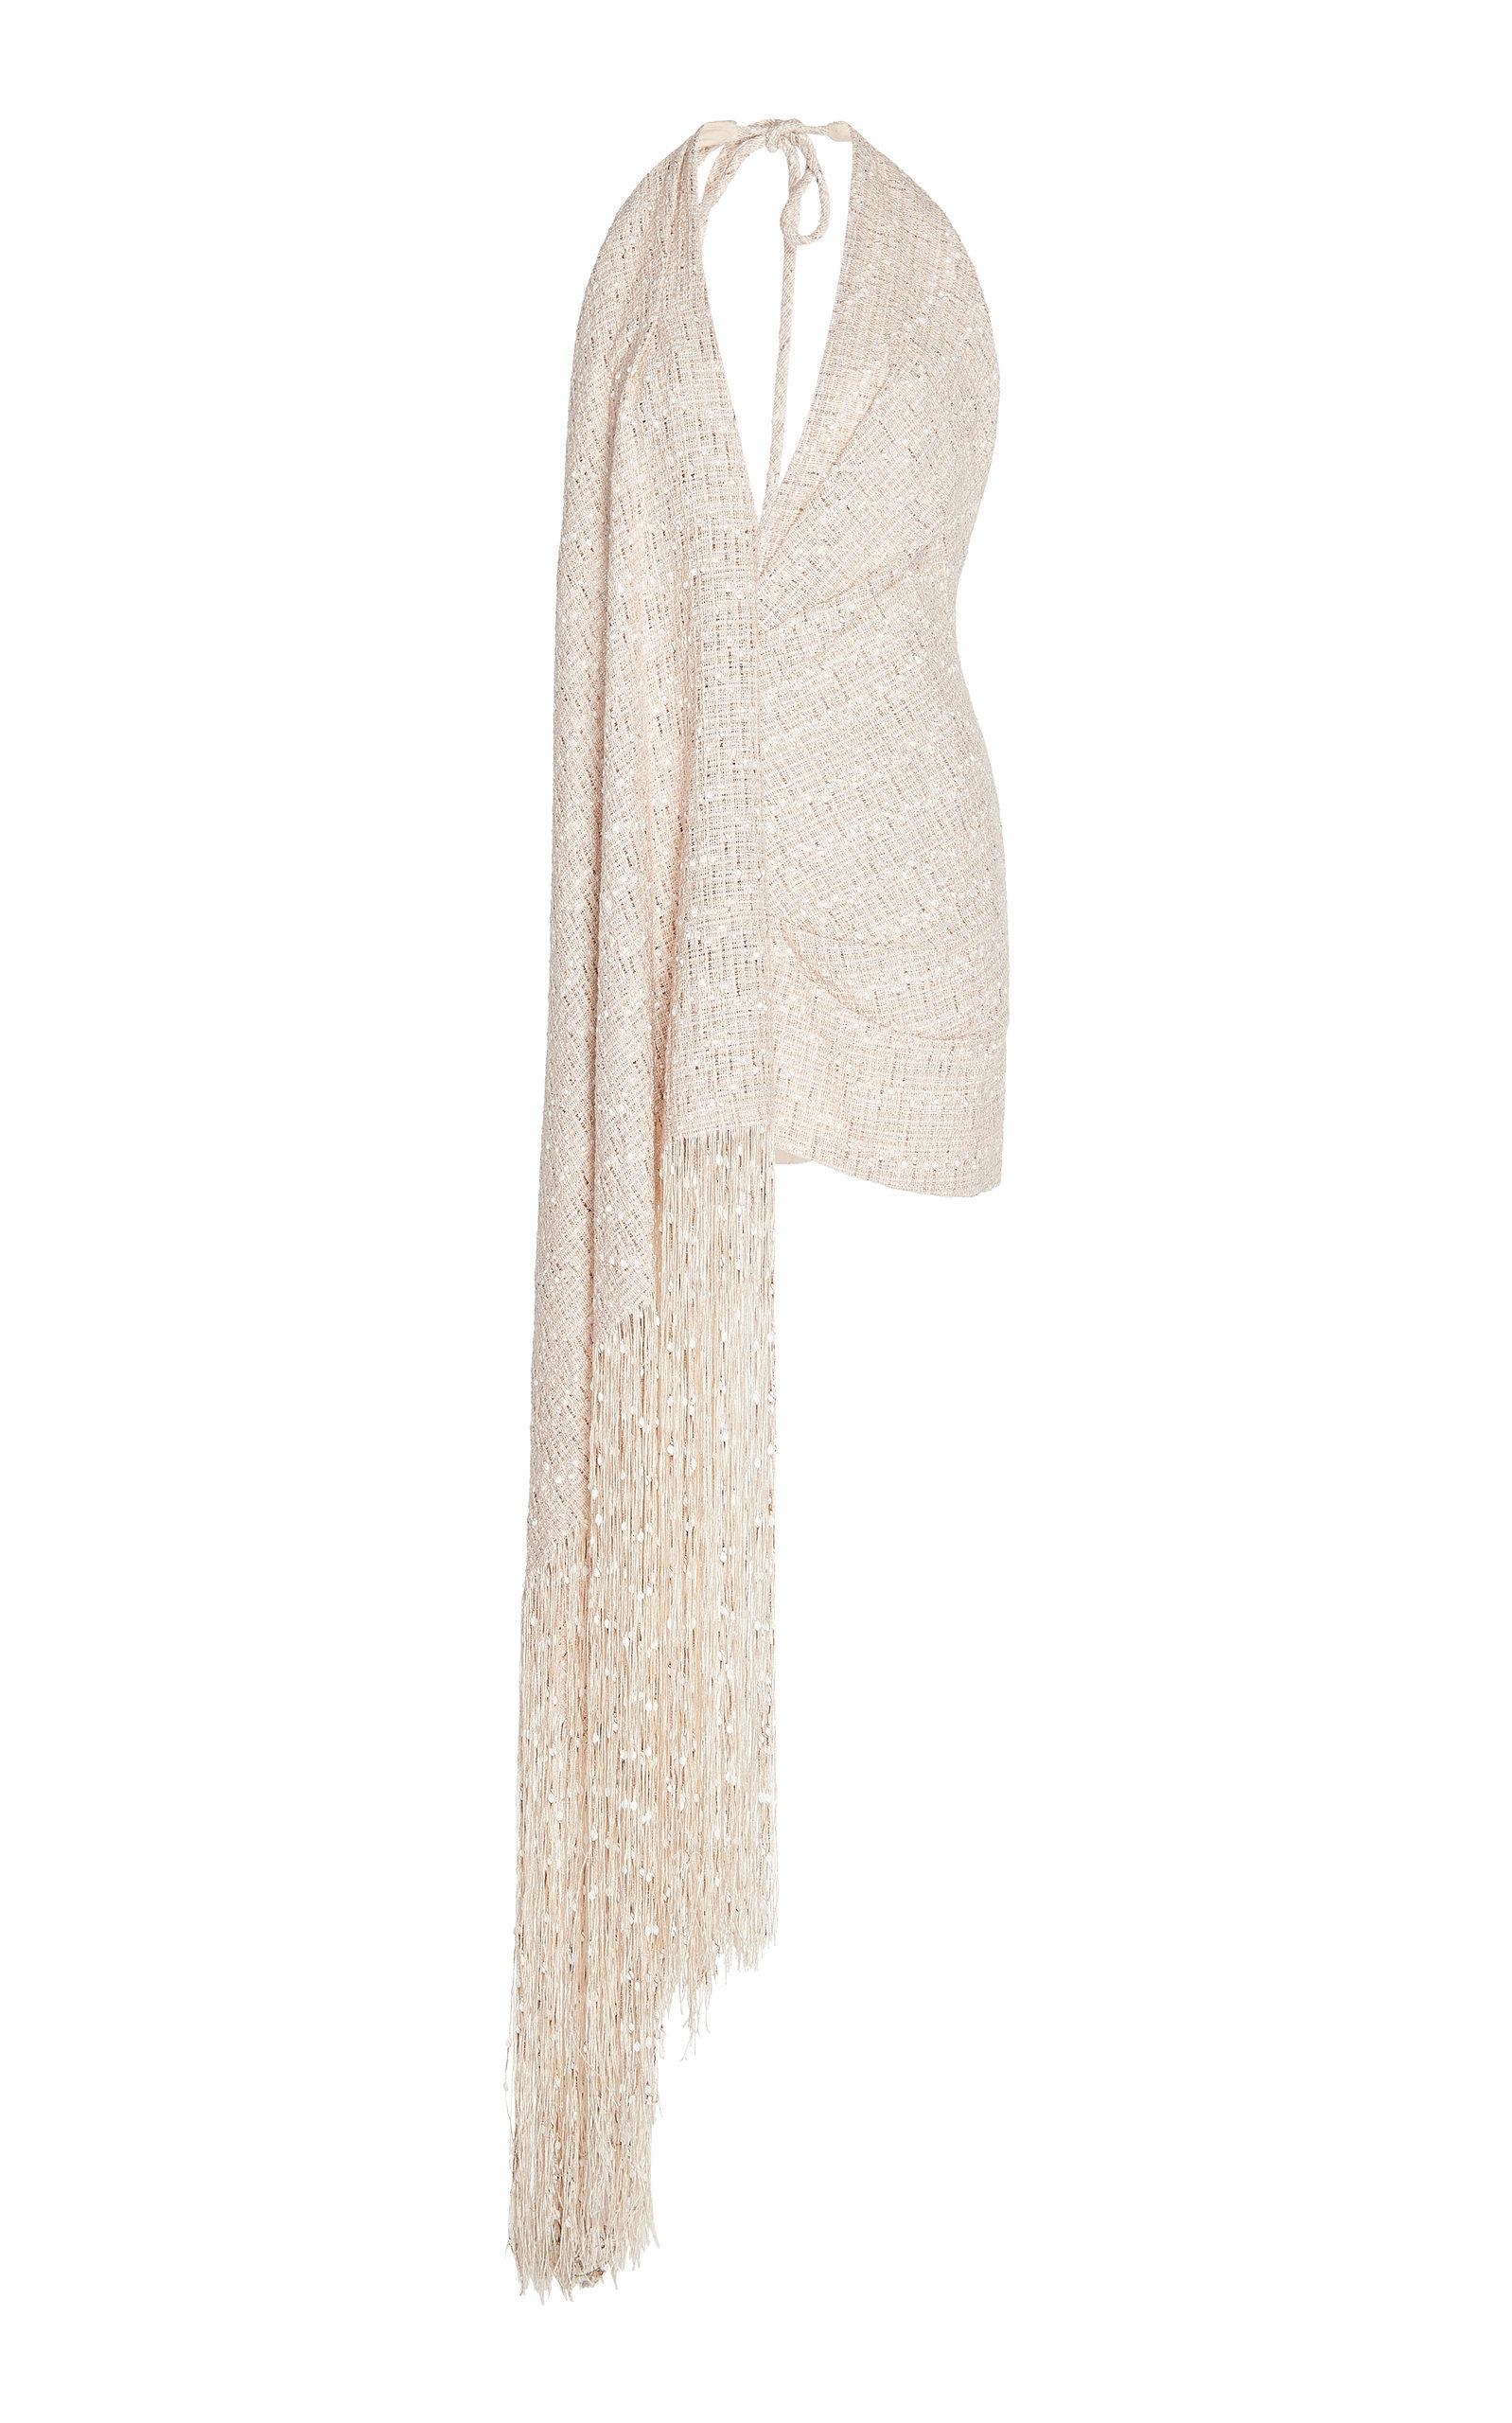 aca682400097 Valoria Fringe-Detail Tweed Dress by JACQUEMUS Now Available on Moda  Operandi